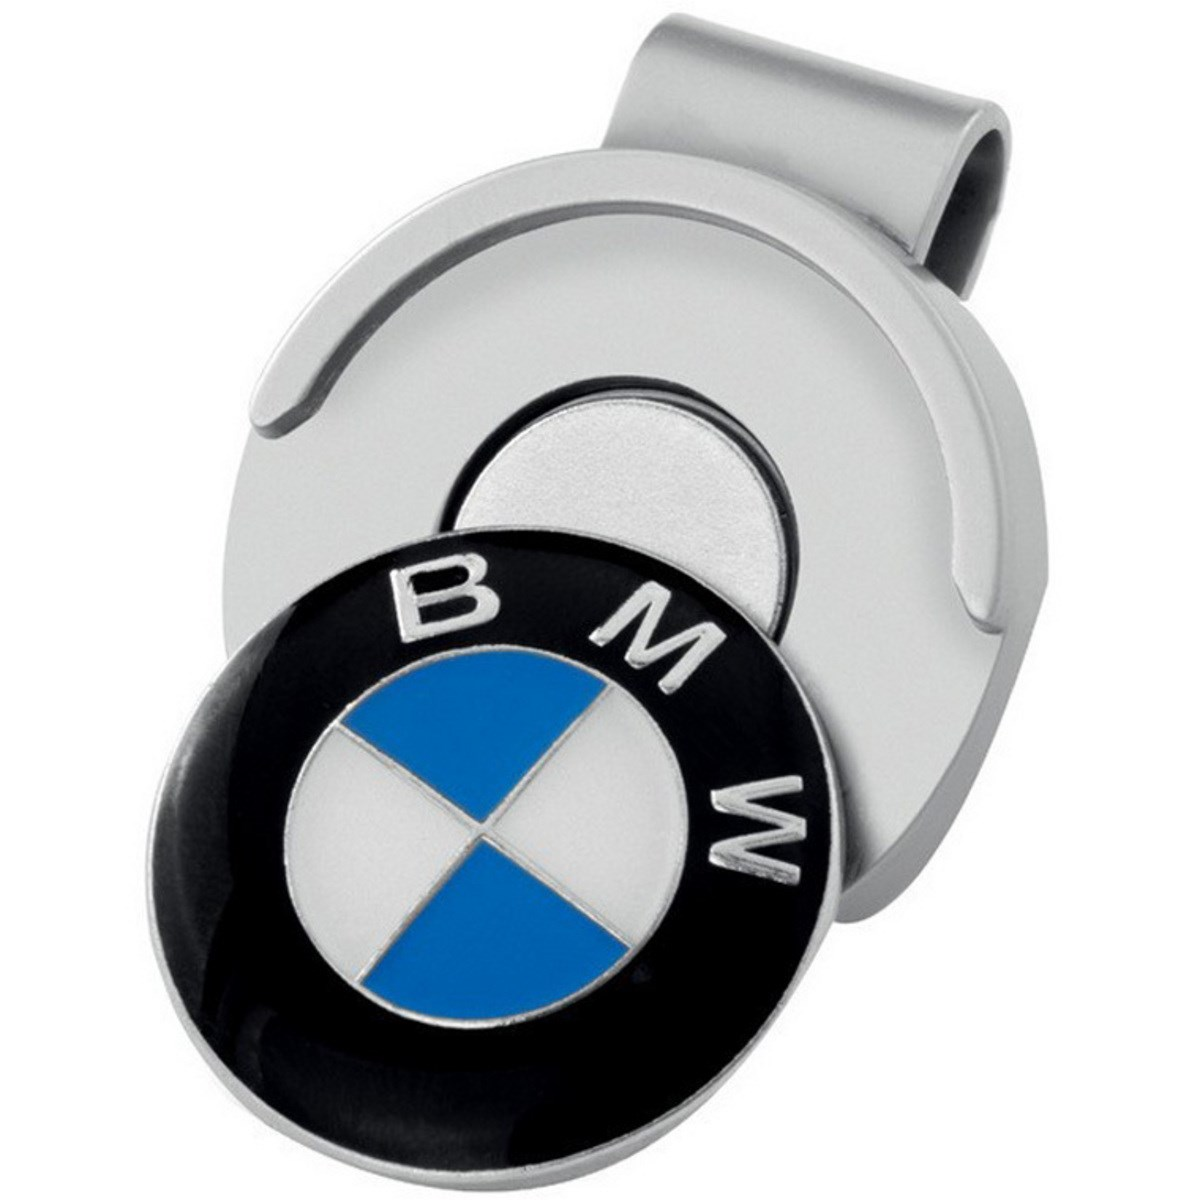 BMW Golfsport Collection キャップ クリップマーカー 80332207969